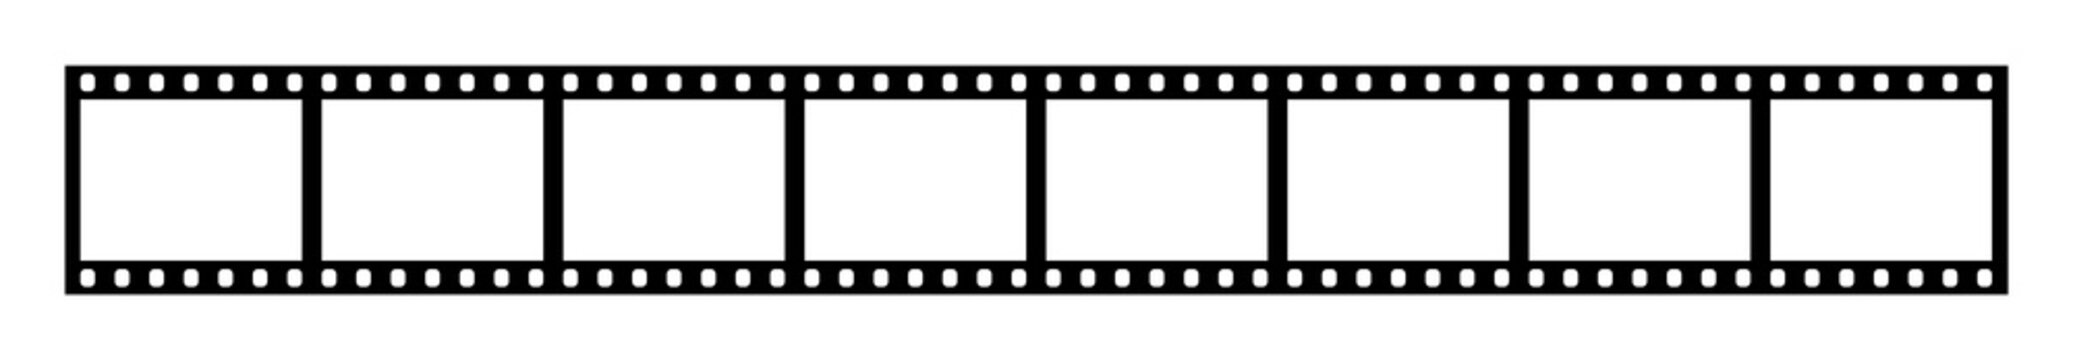 Eight empty frames of 35 mm film strip